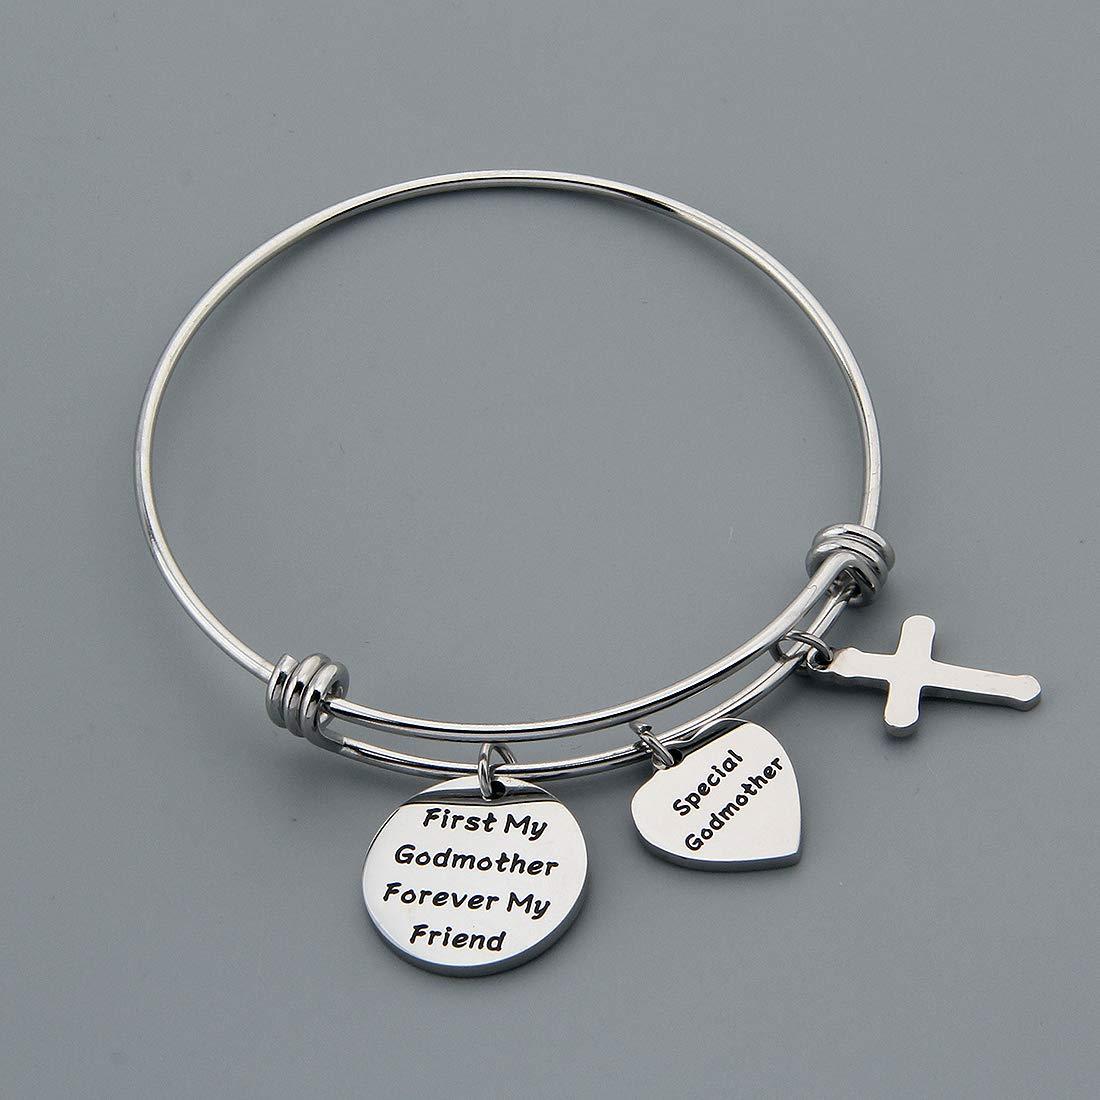 HOLLP Godmother Bracelet Godmother Gifts from Godchild First My Godmother Forever My Friend Godmother Bangle Bracelet Cross Charm Communion Gift